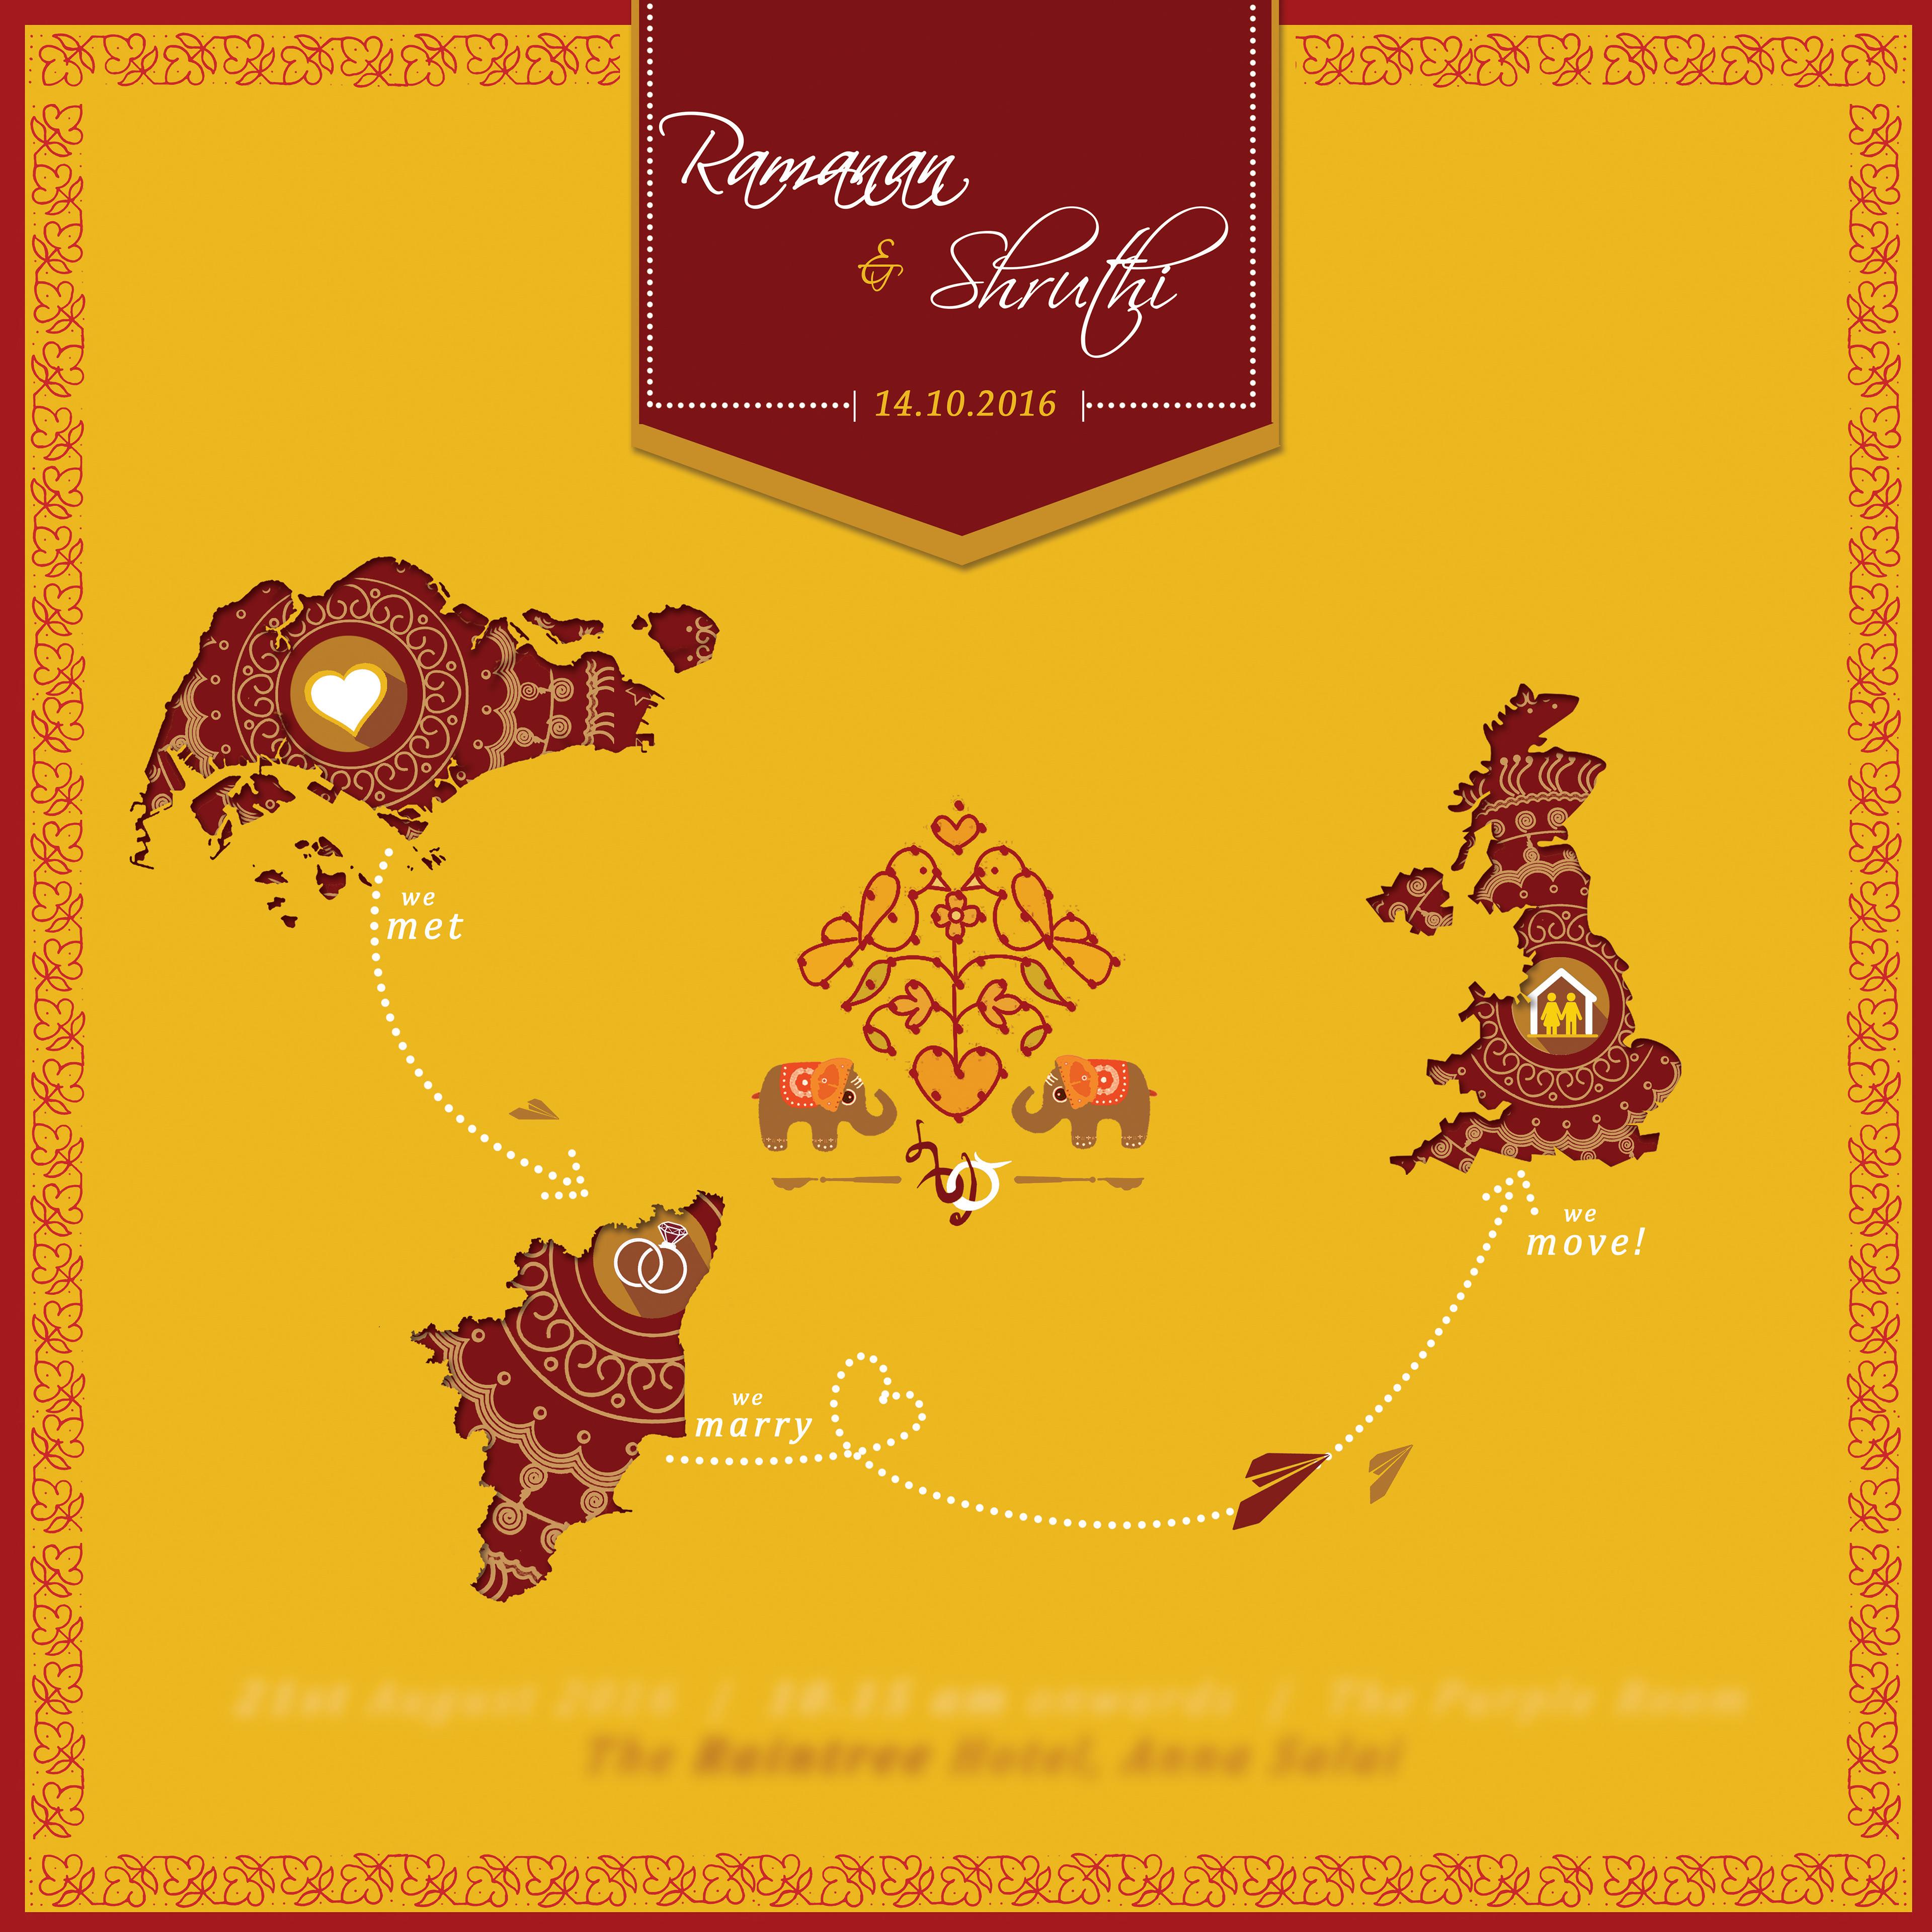 Culture Curry - Creative Invitations - Indian E-Invitations